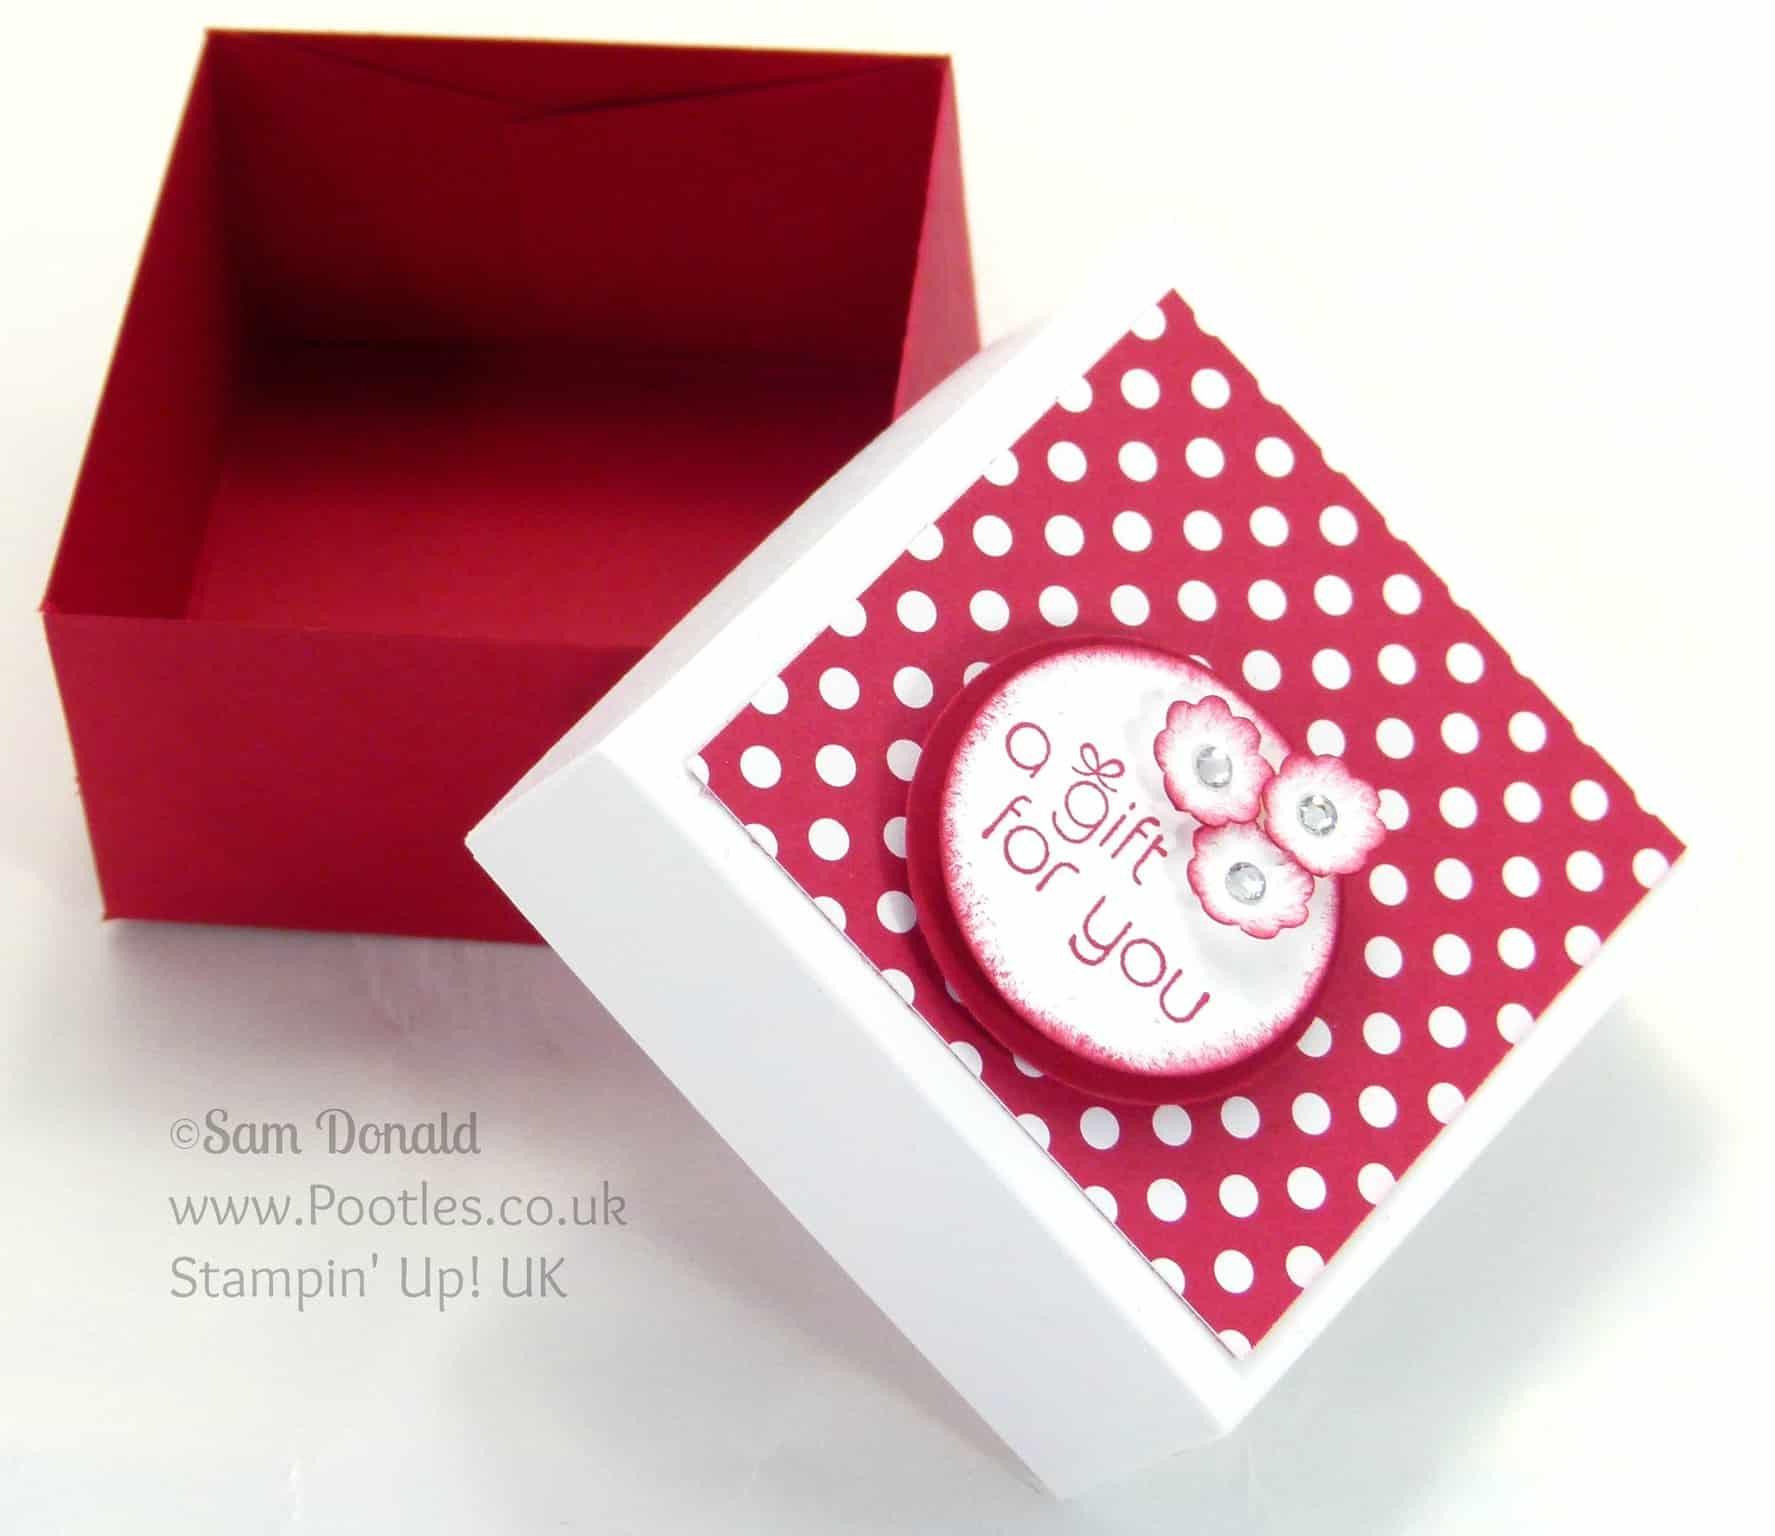 POOTLES Stampin' Up! UK The Spotty Box +Bonus Customer Gift Open